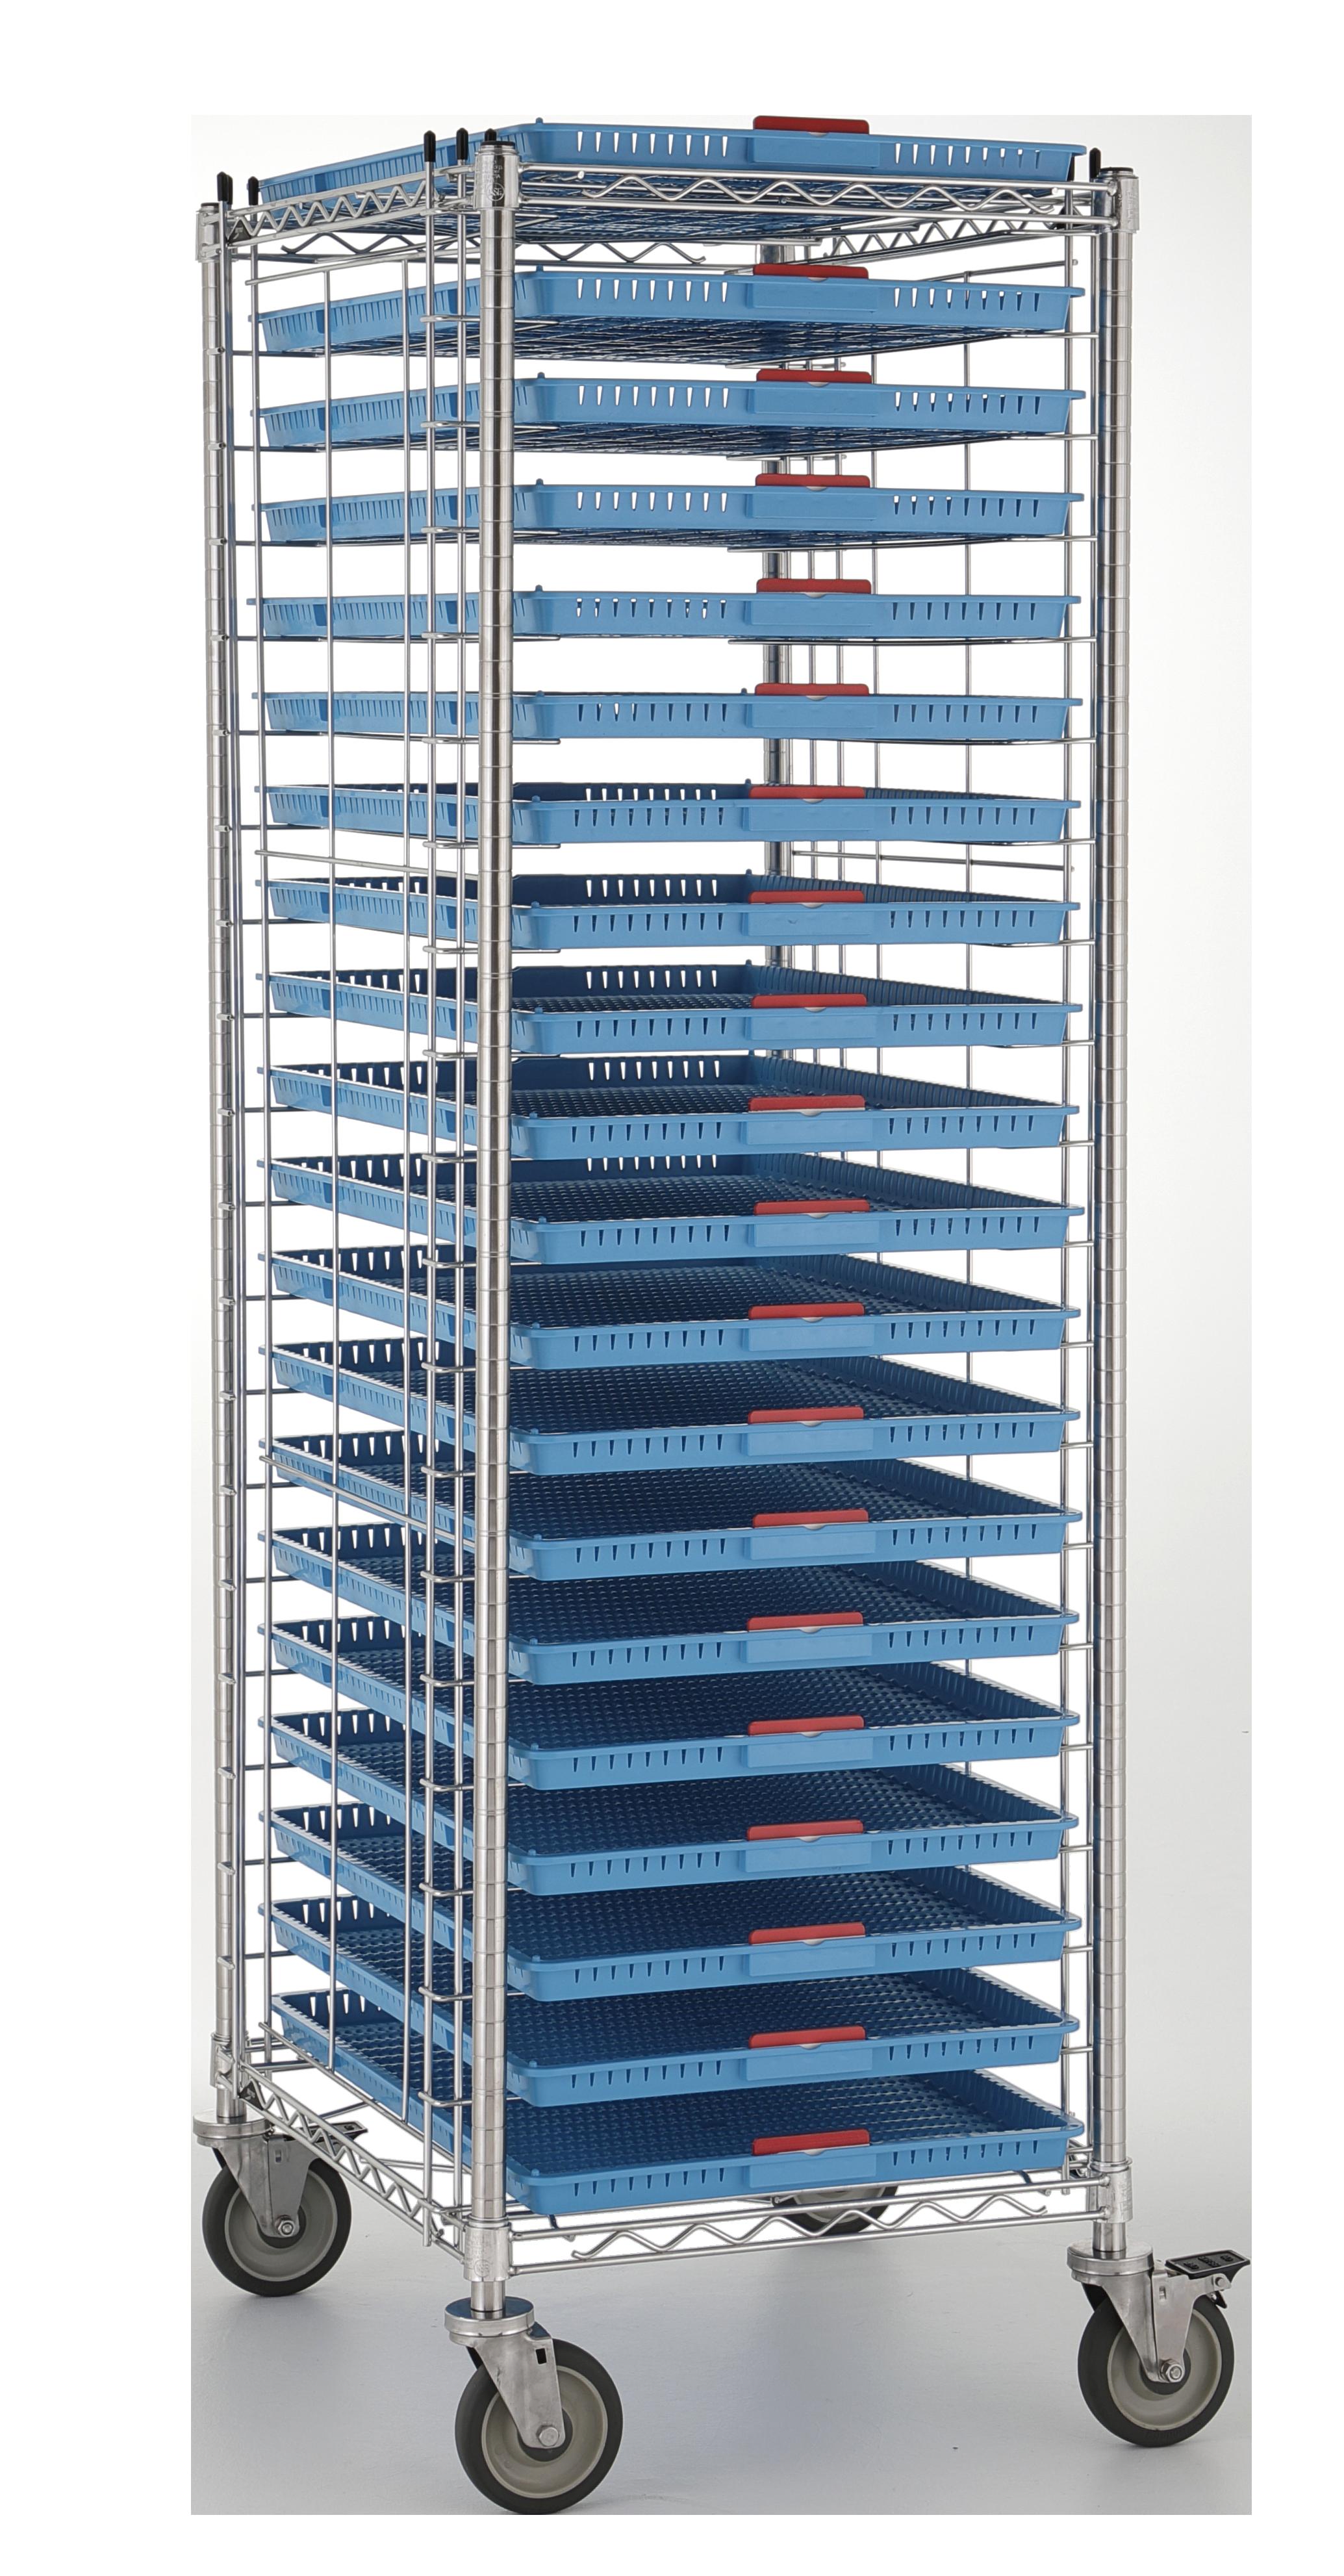 Tray Drying Rack In 2020 Drying Rack Tray Rack